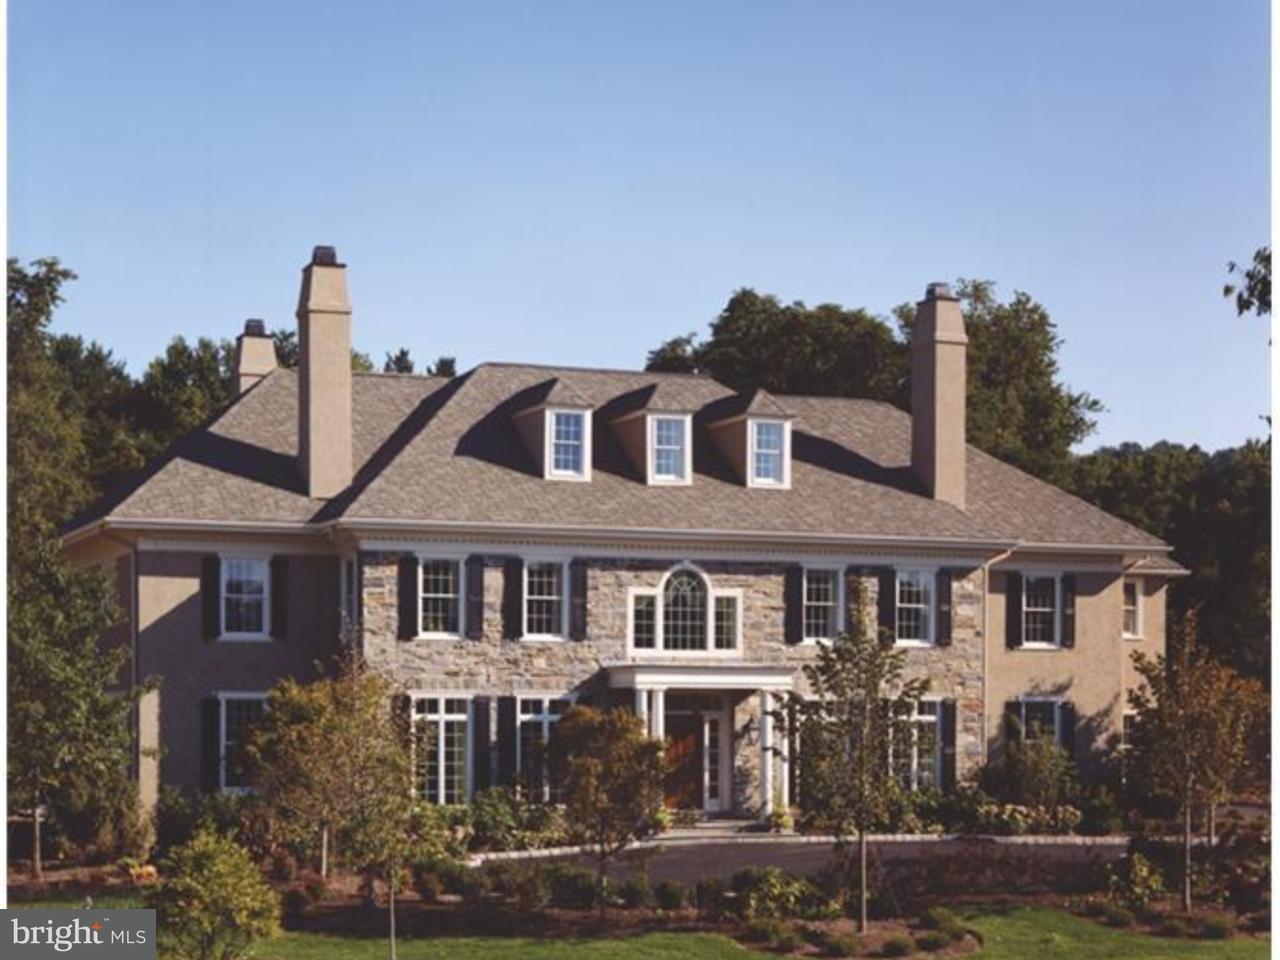 Enfamiljshus för Hyra vid 1017 WHITEGATE Road Wayne, Pennsylvania 19087 Usa